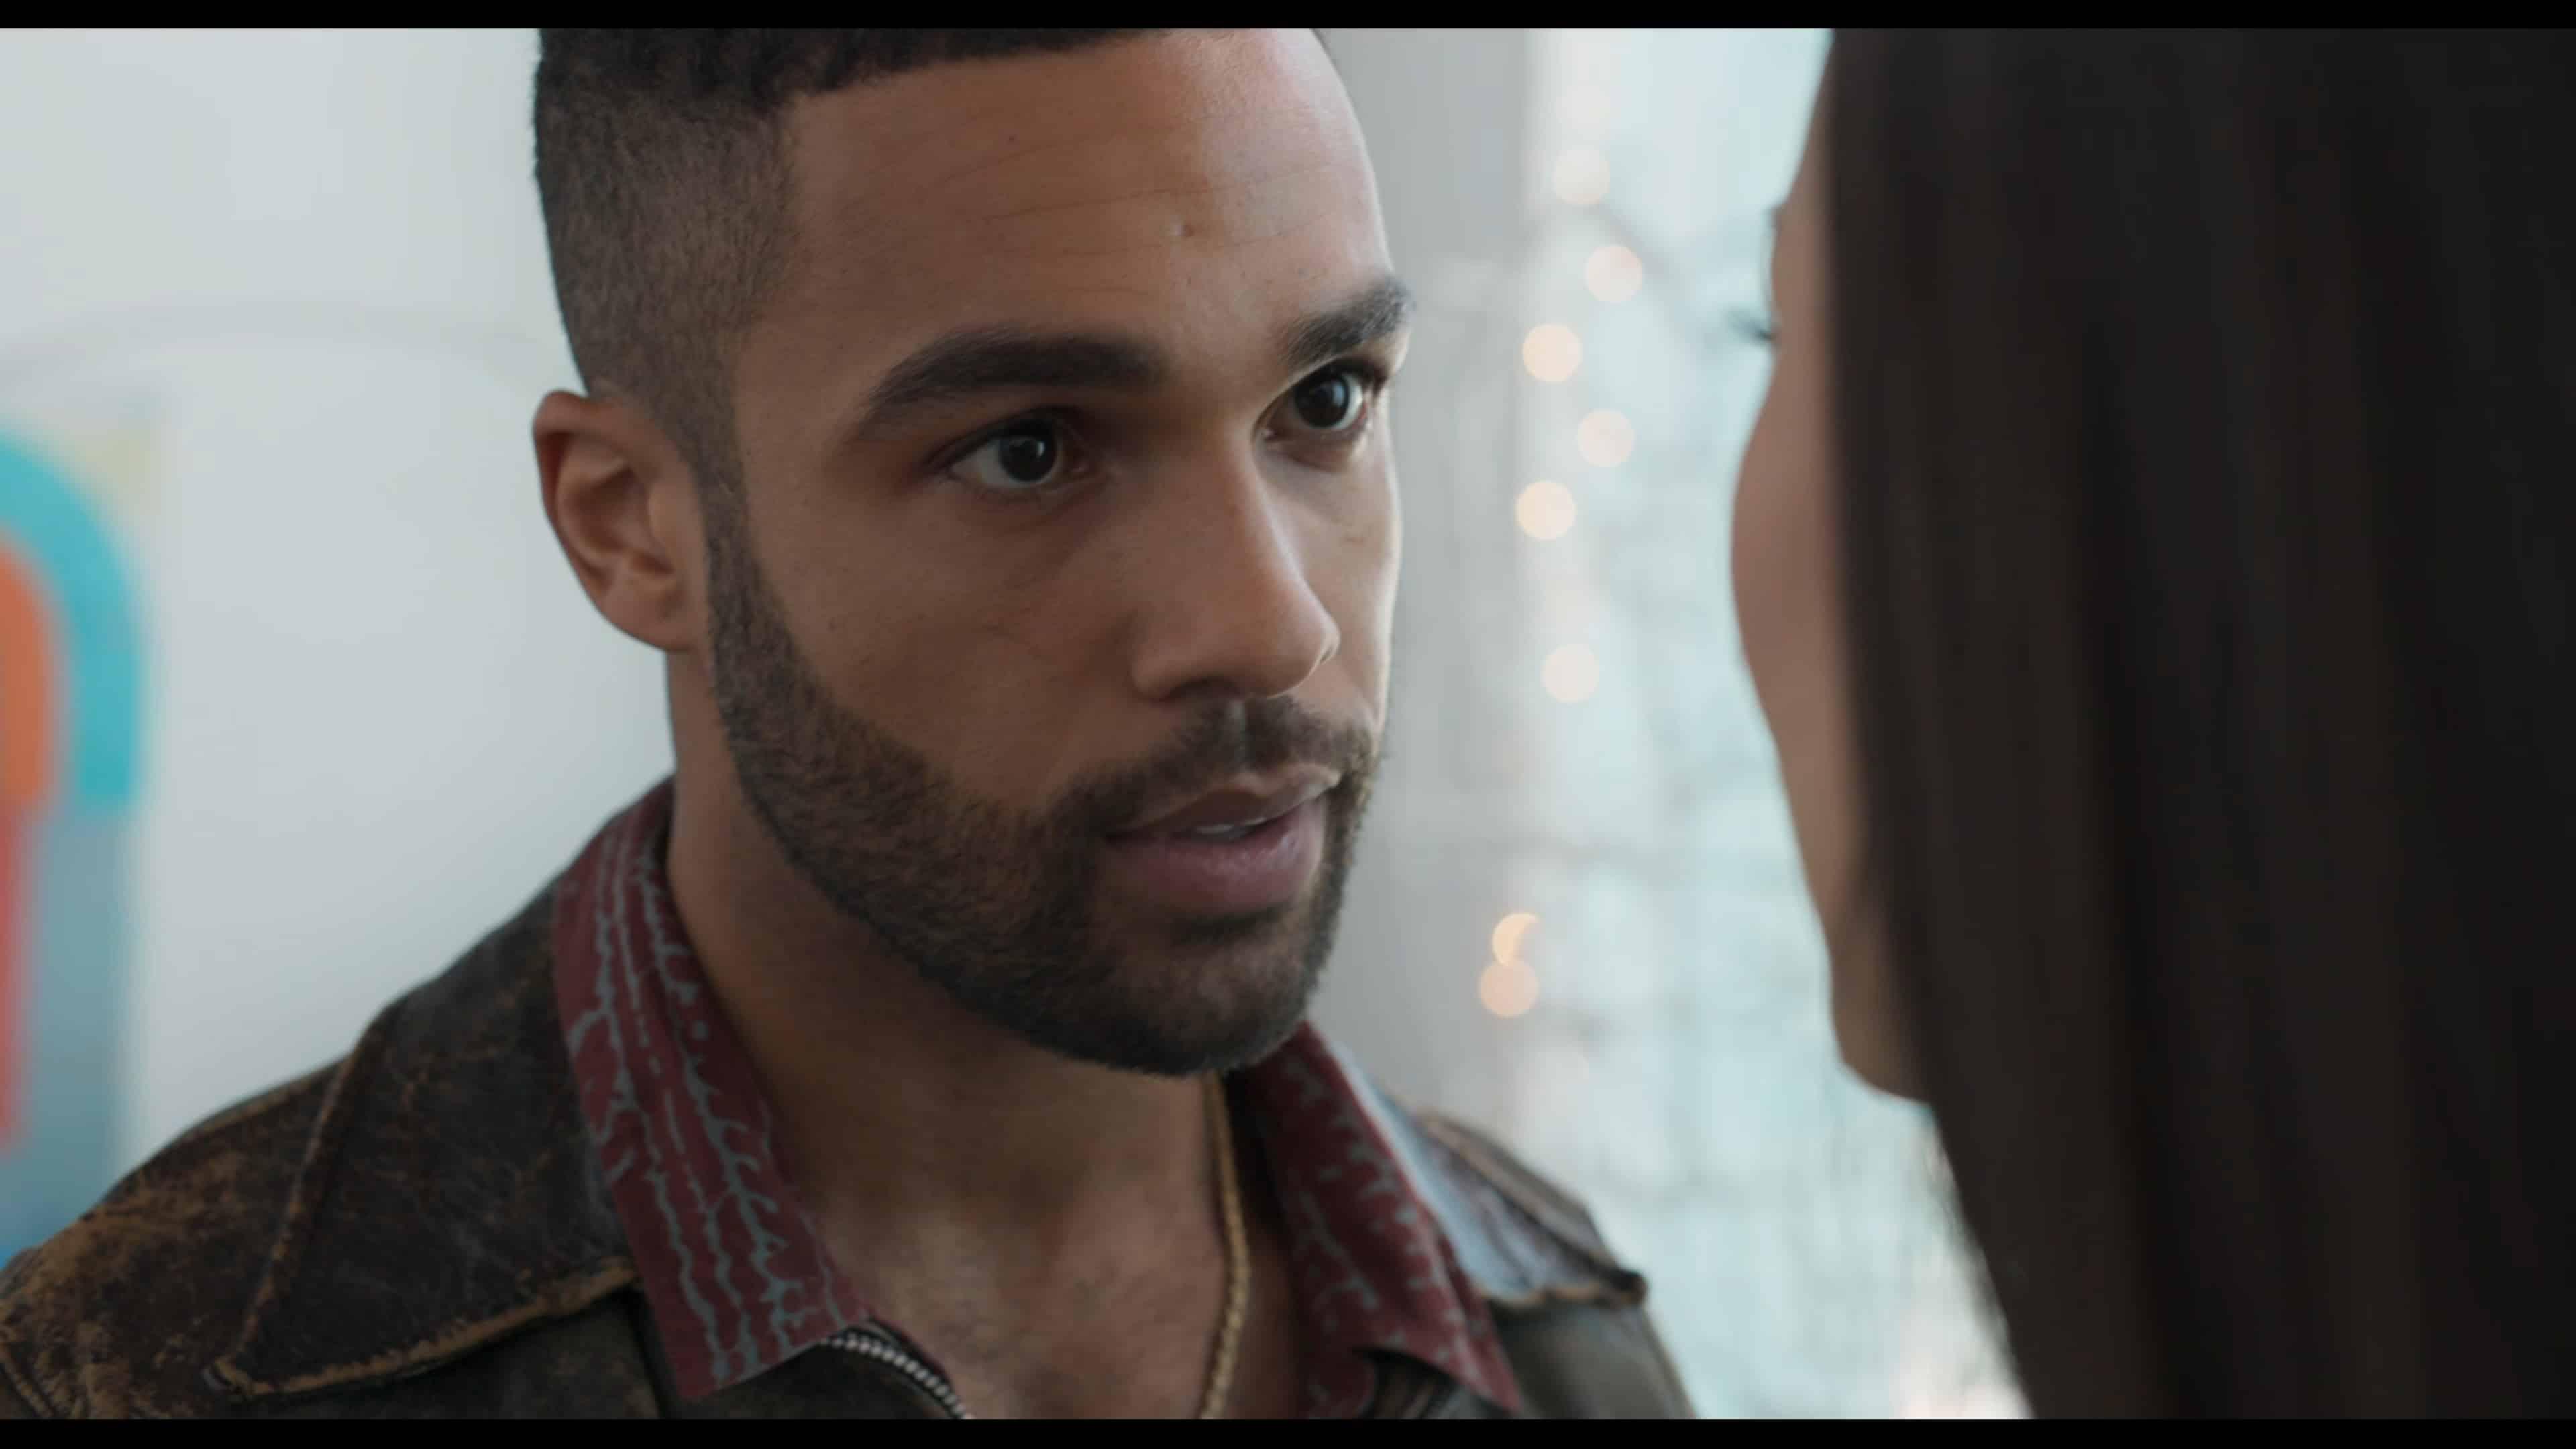 Ansgar (Lucien Laviscount) trying to seduce Brooke